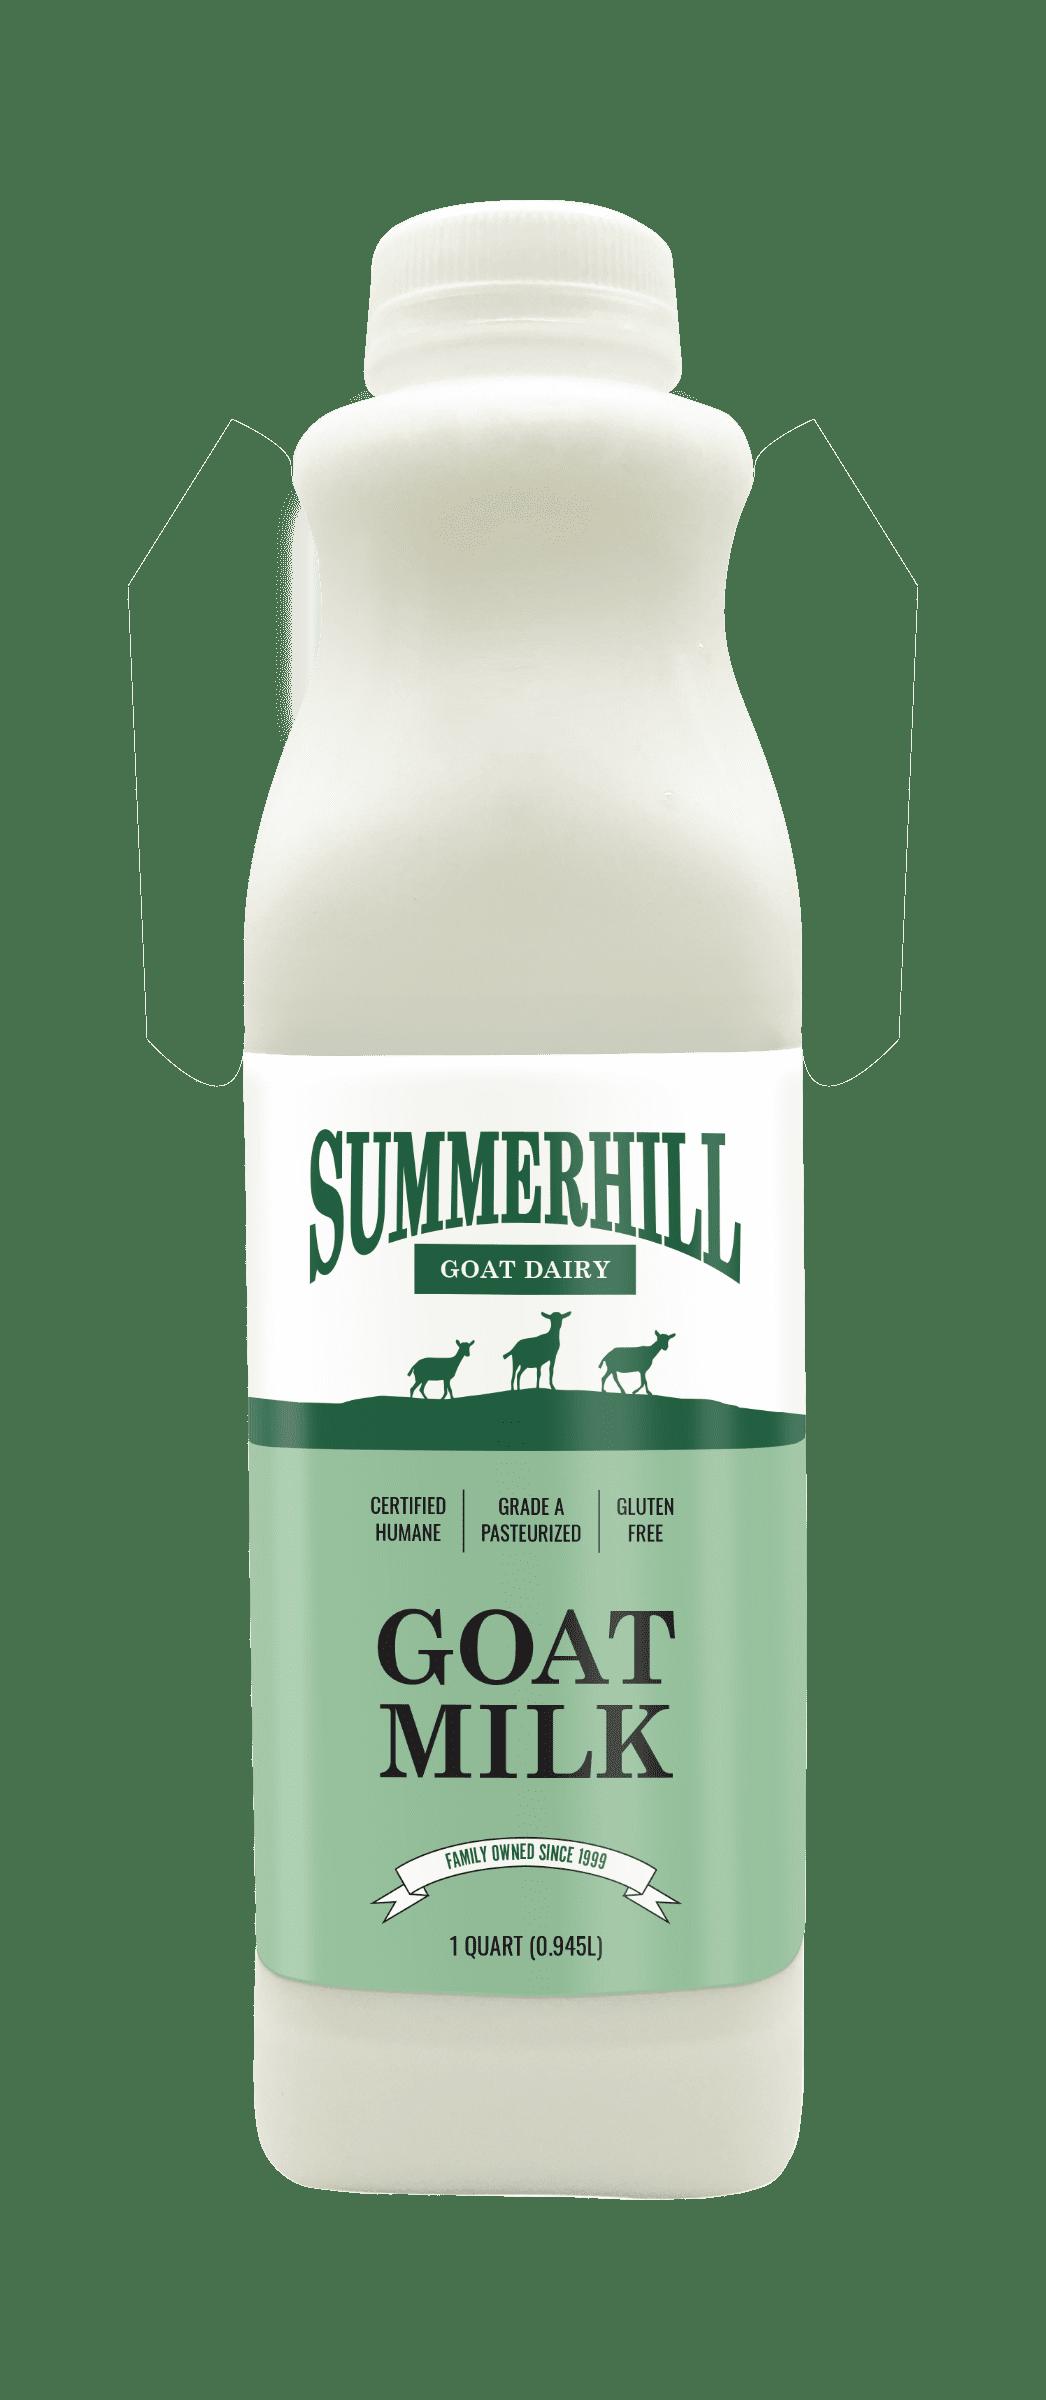 Summerhill dairy goat milk 32oz bottle